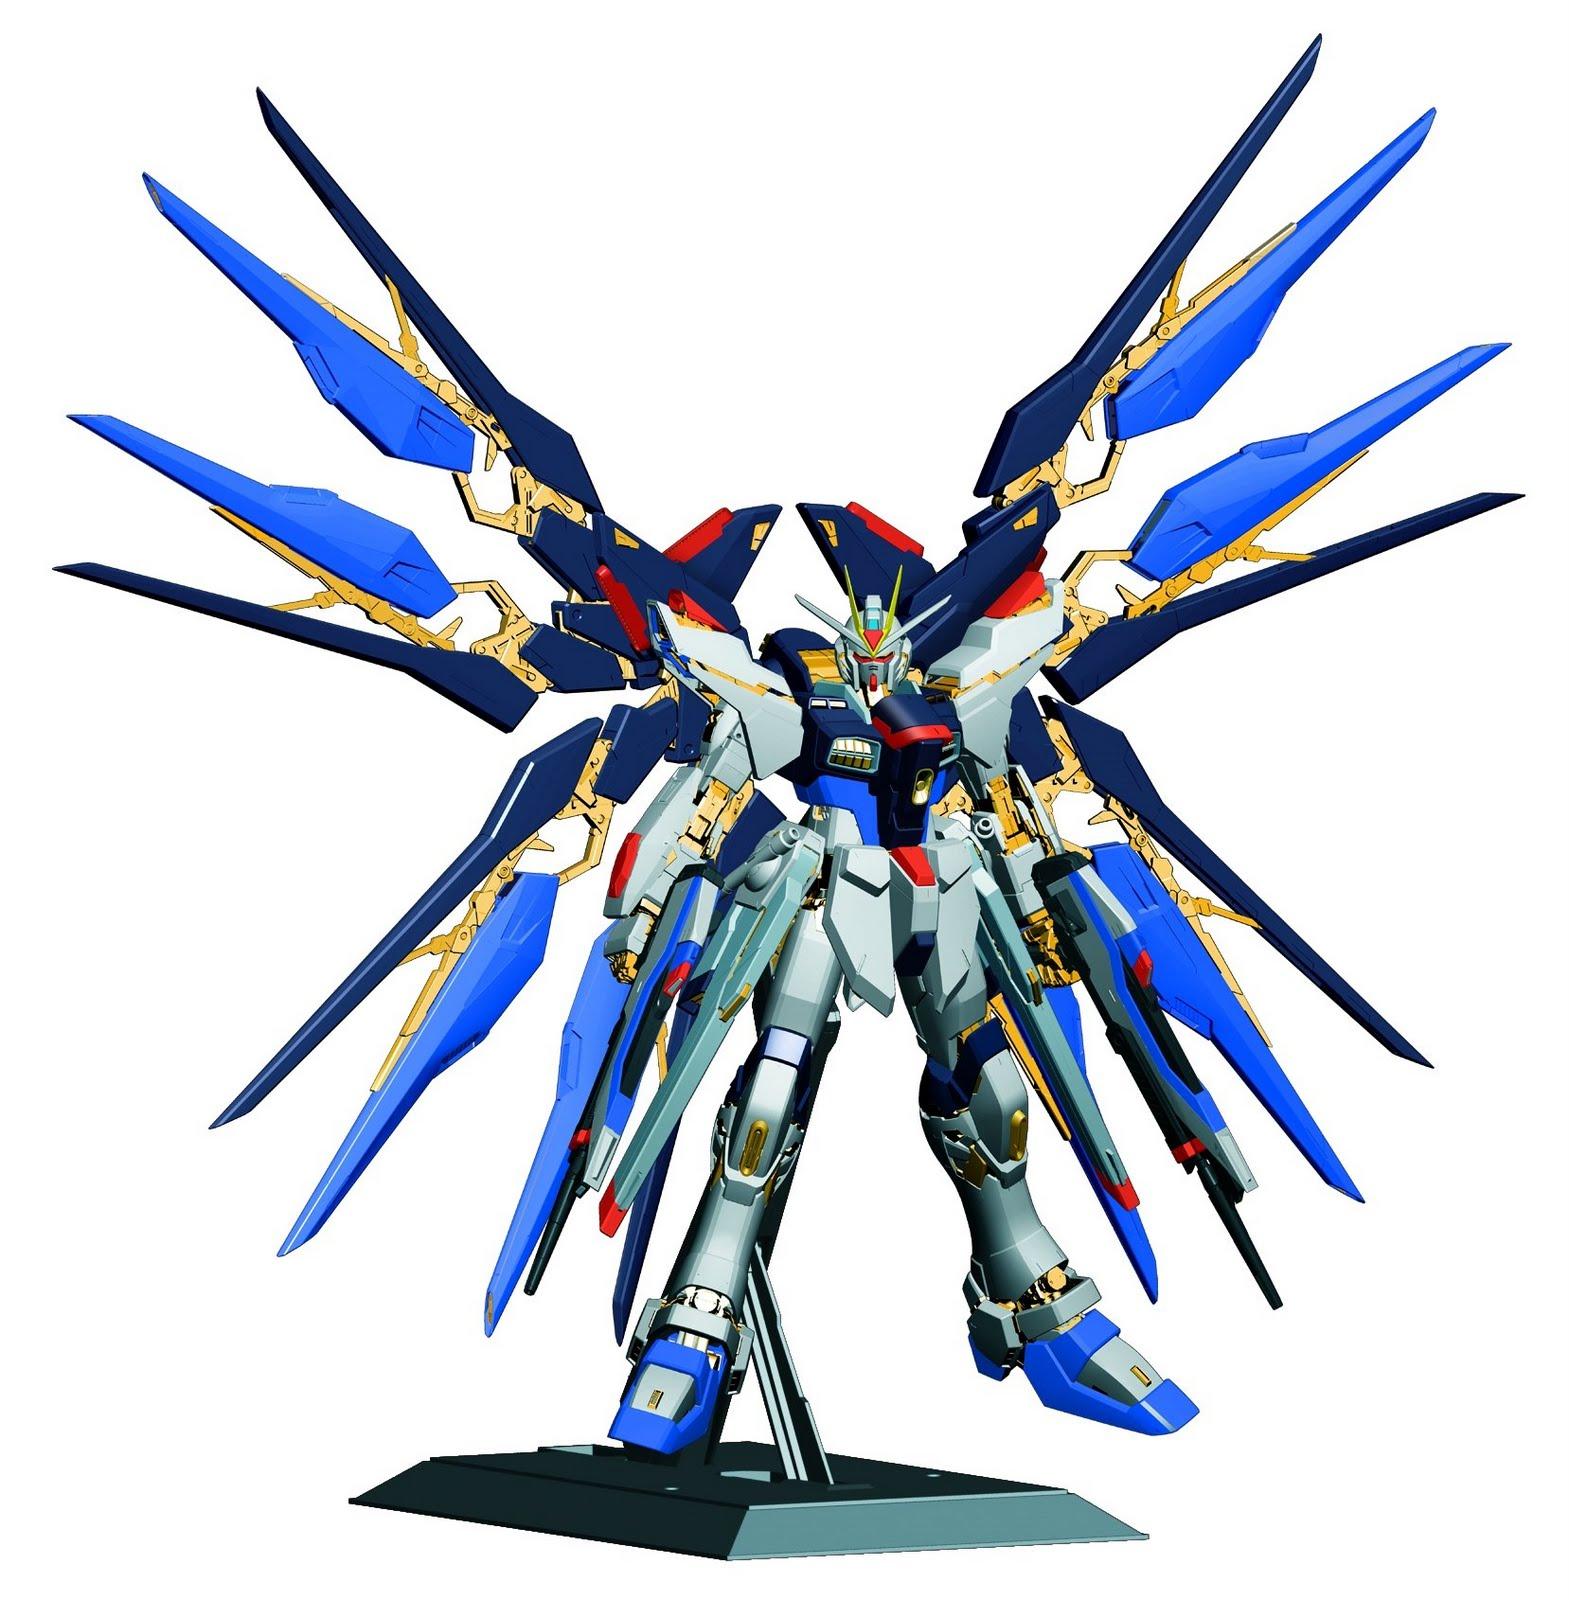 PG 160 Strike Freedom Gundam wallpaper size Images GUNJAP 1569x1600